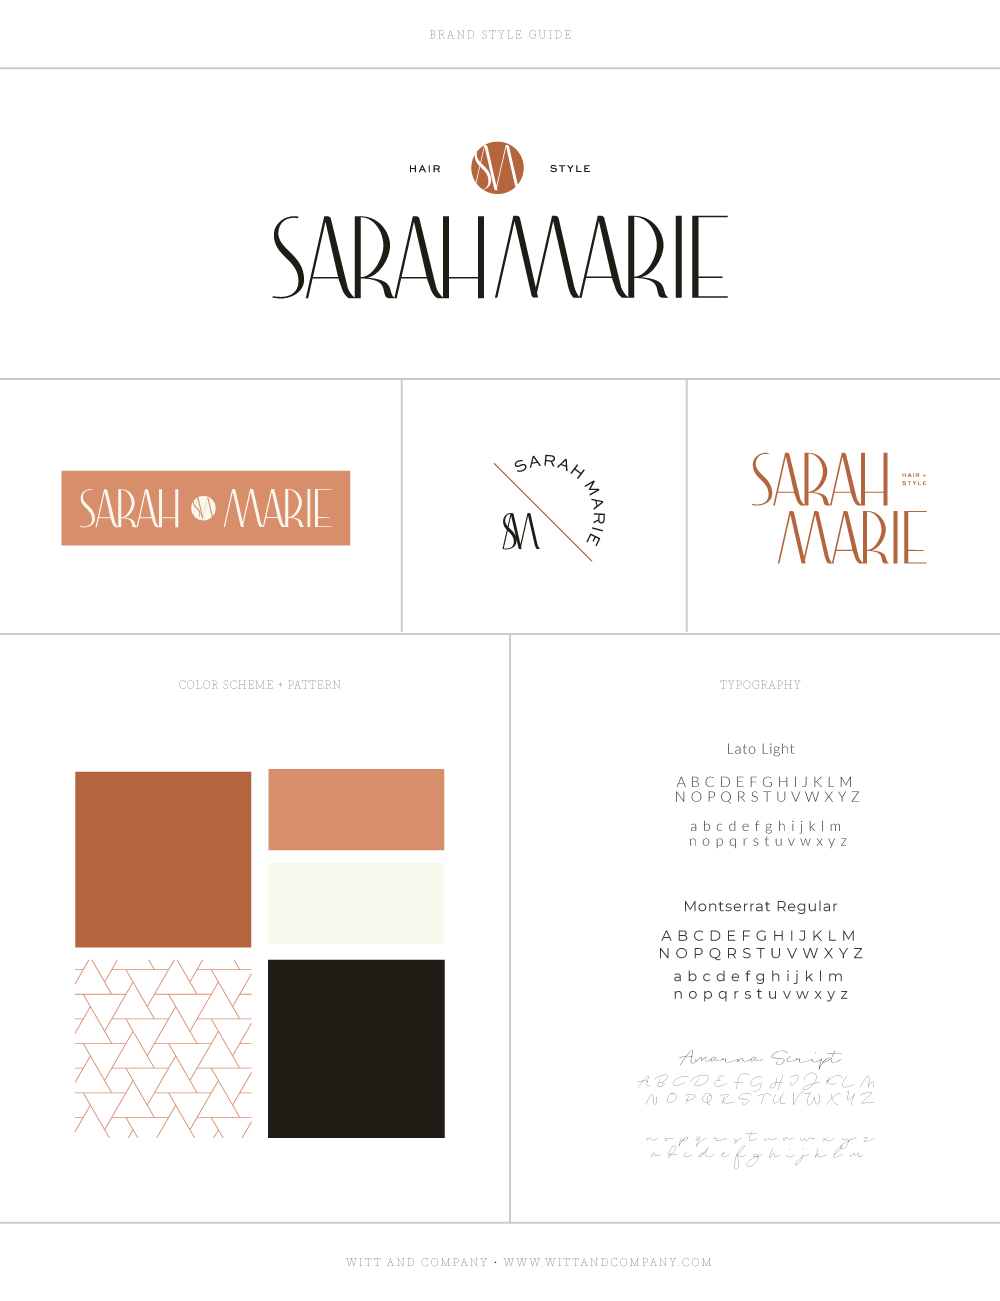 Sarah Marie Custom Brand Design | Witt and Company